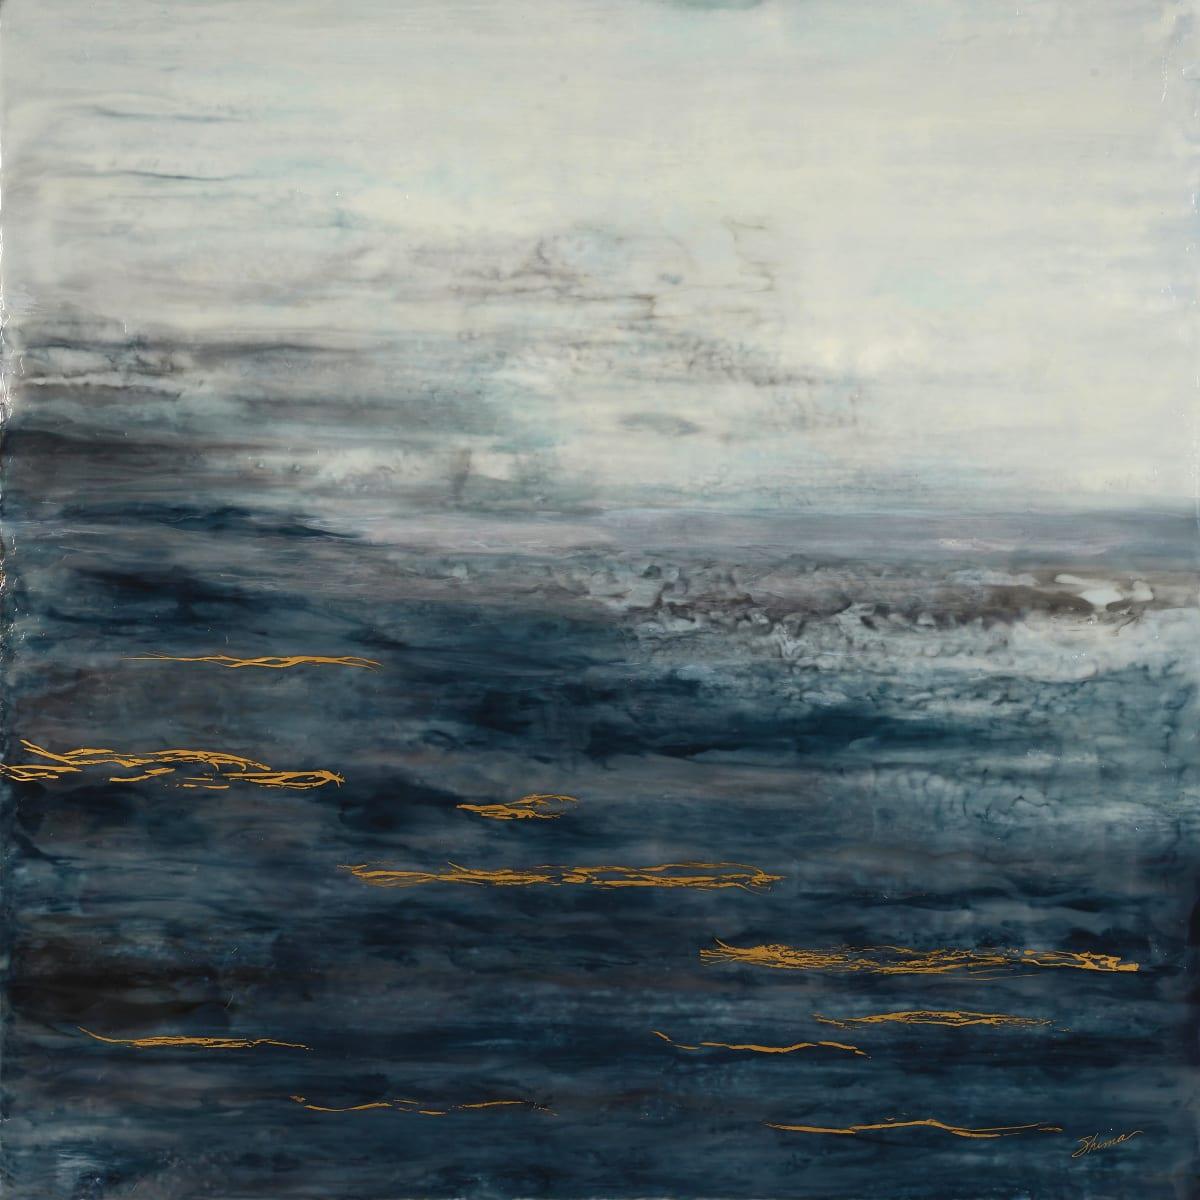 Waves on Nightfall by Shima Shanti